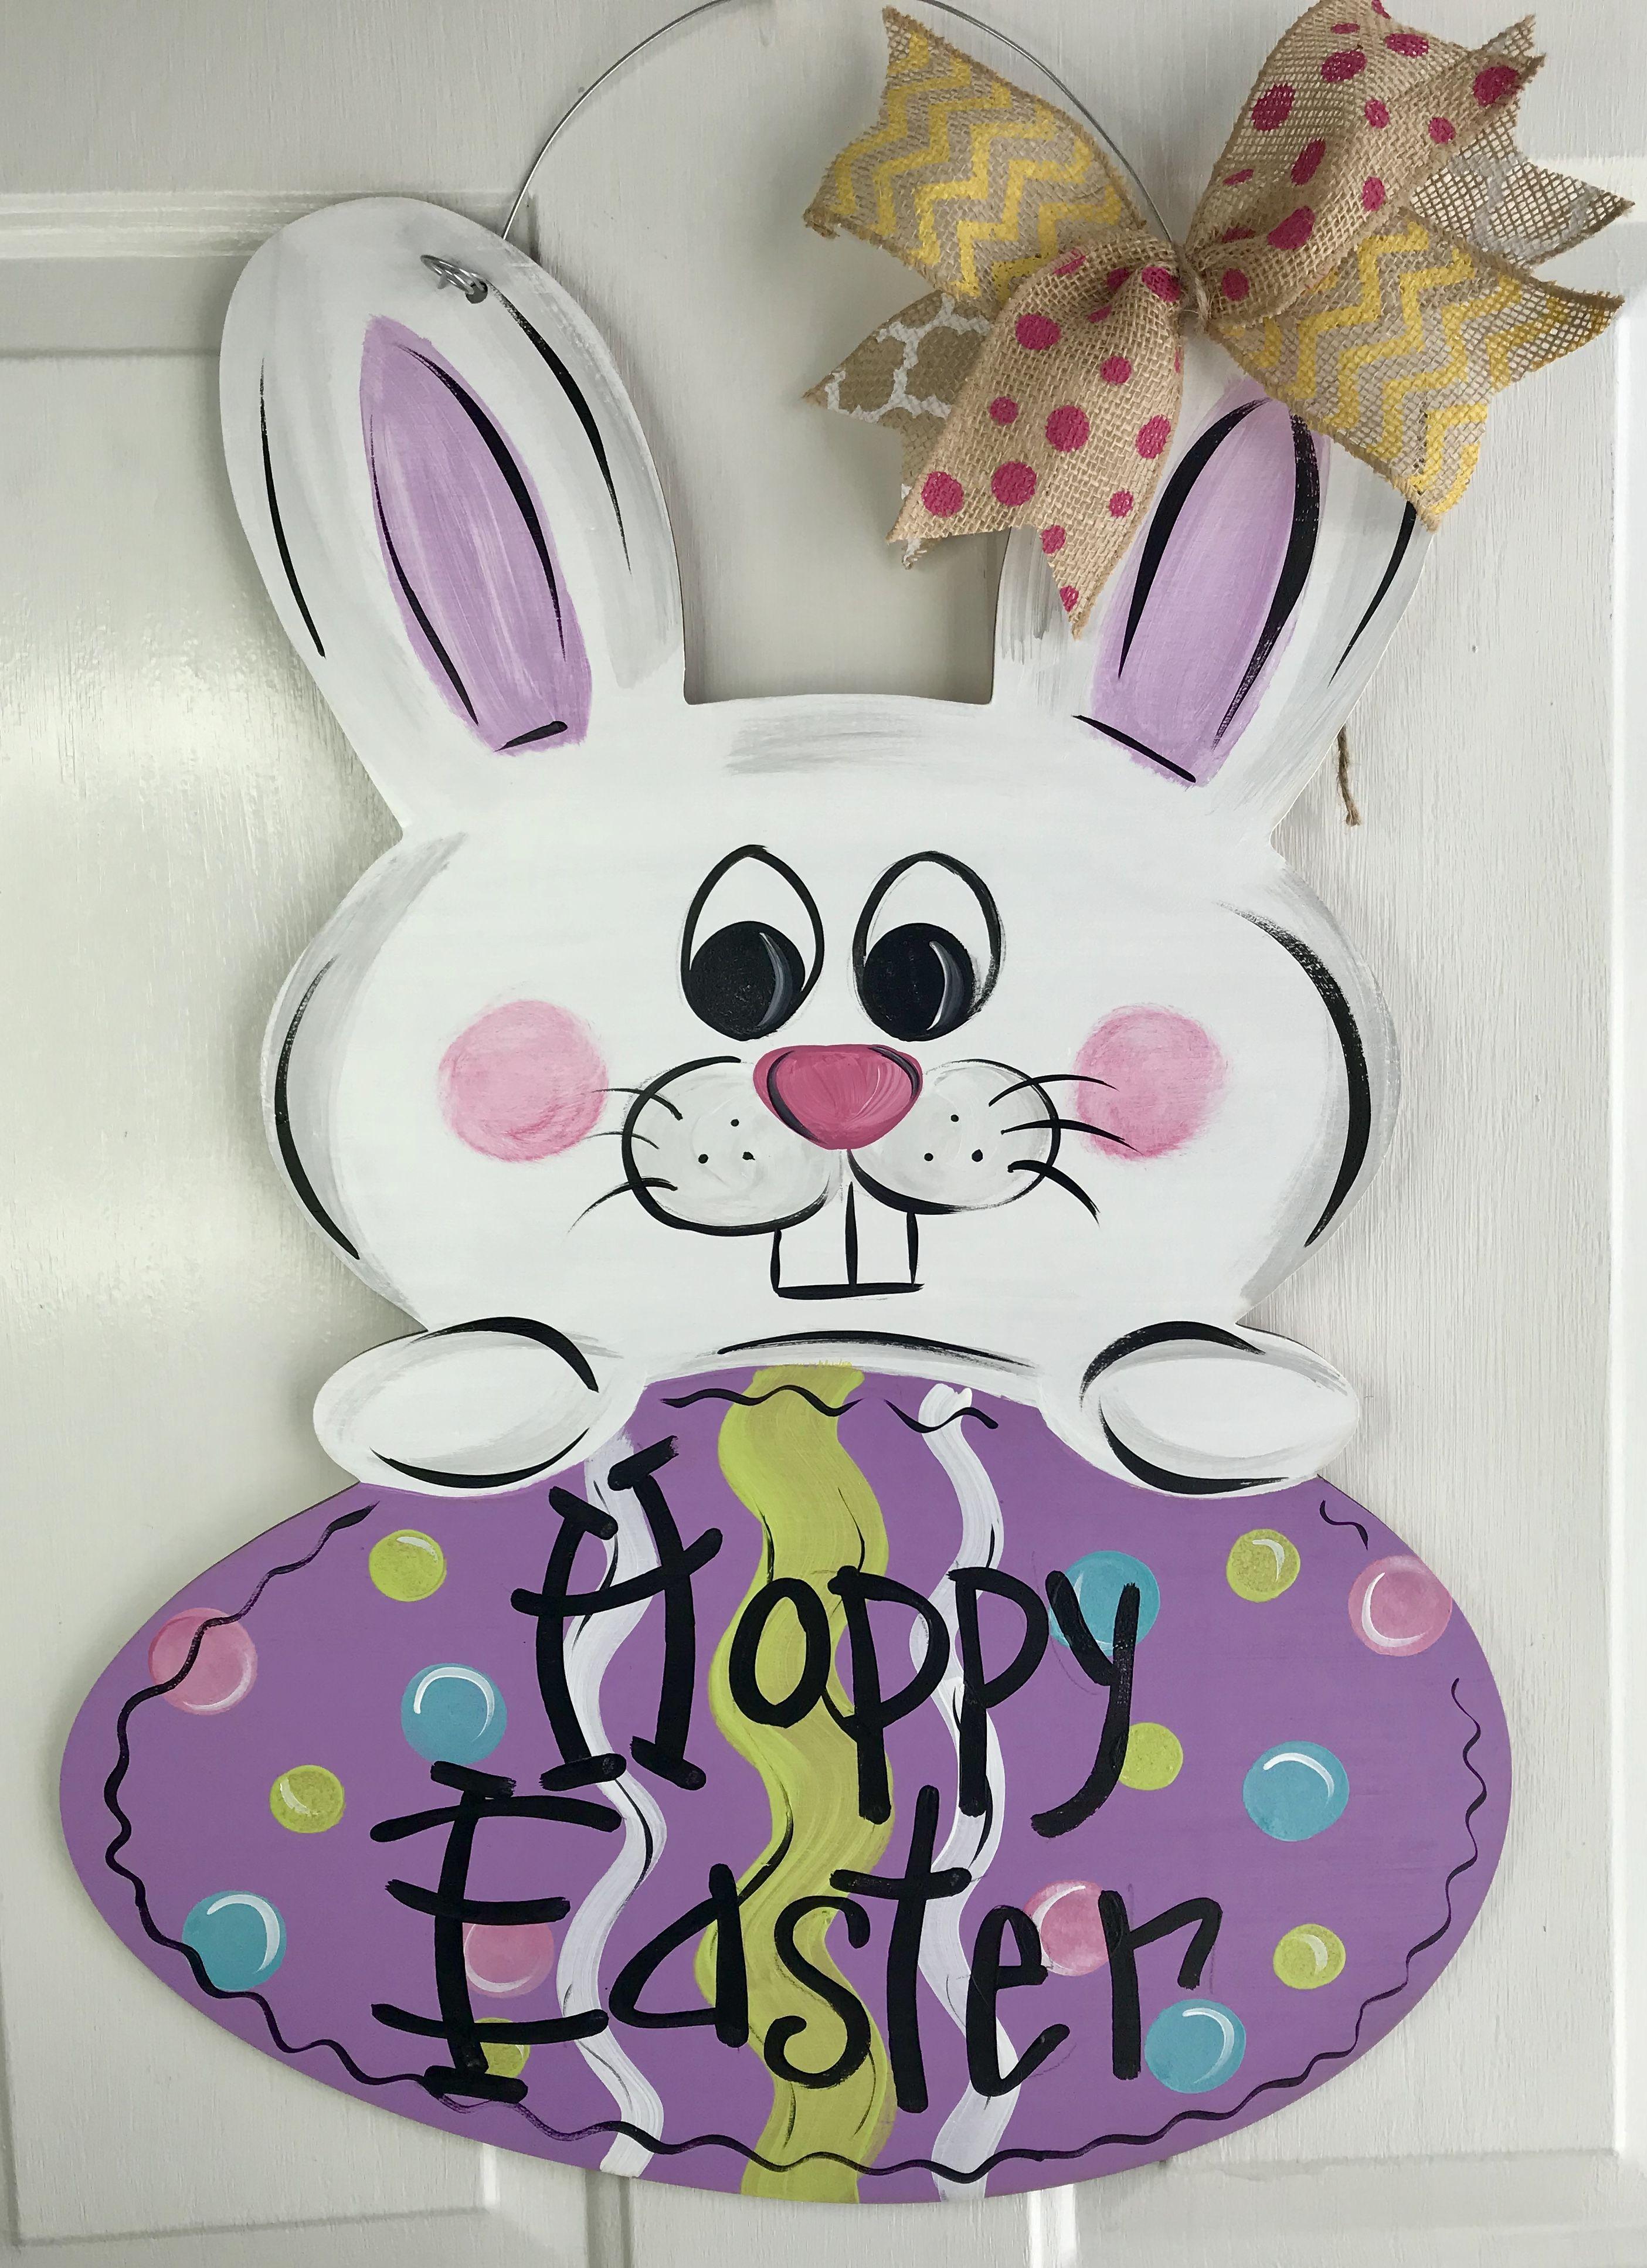 Bunny Decor Easter Decoration Easter Hanger Easter Decor Easter Door Hanger Bunny Wreath Easter Bunny Bunny Hanger Bunny Door Hanger